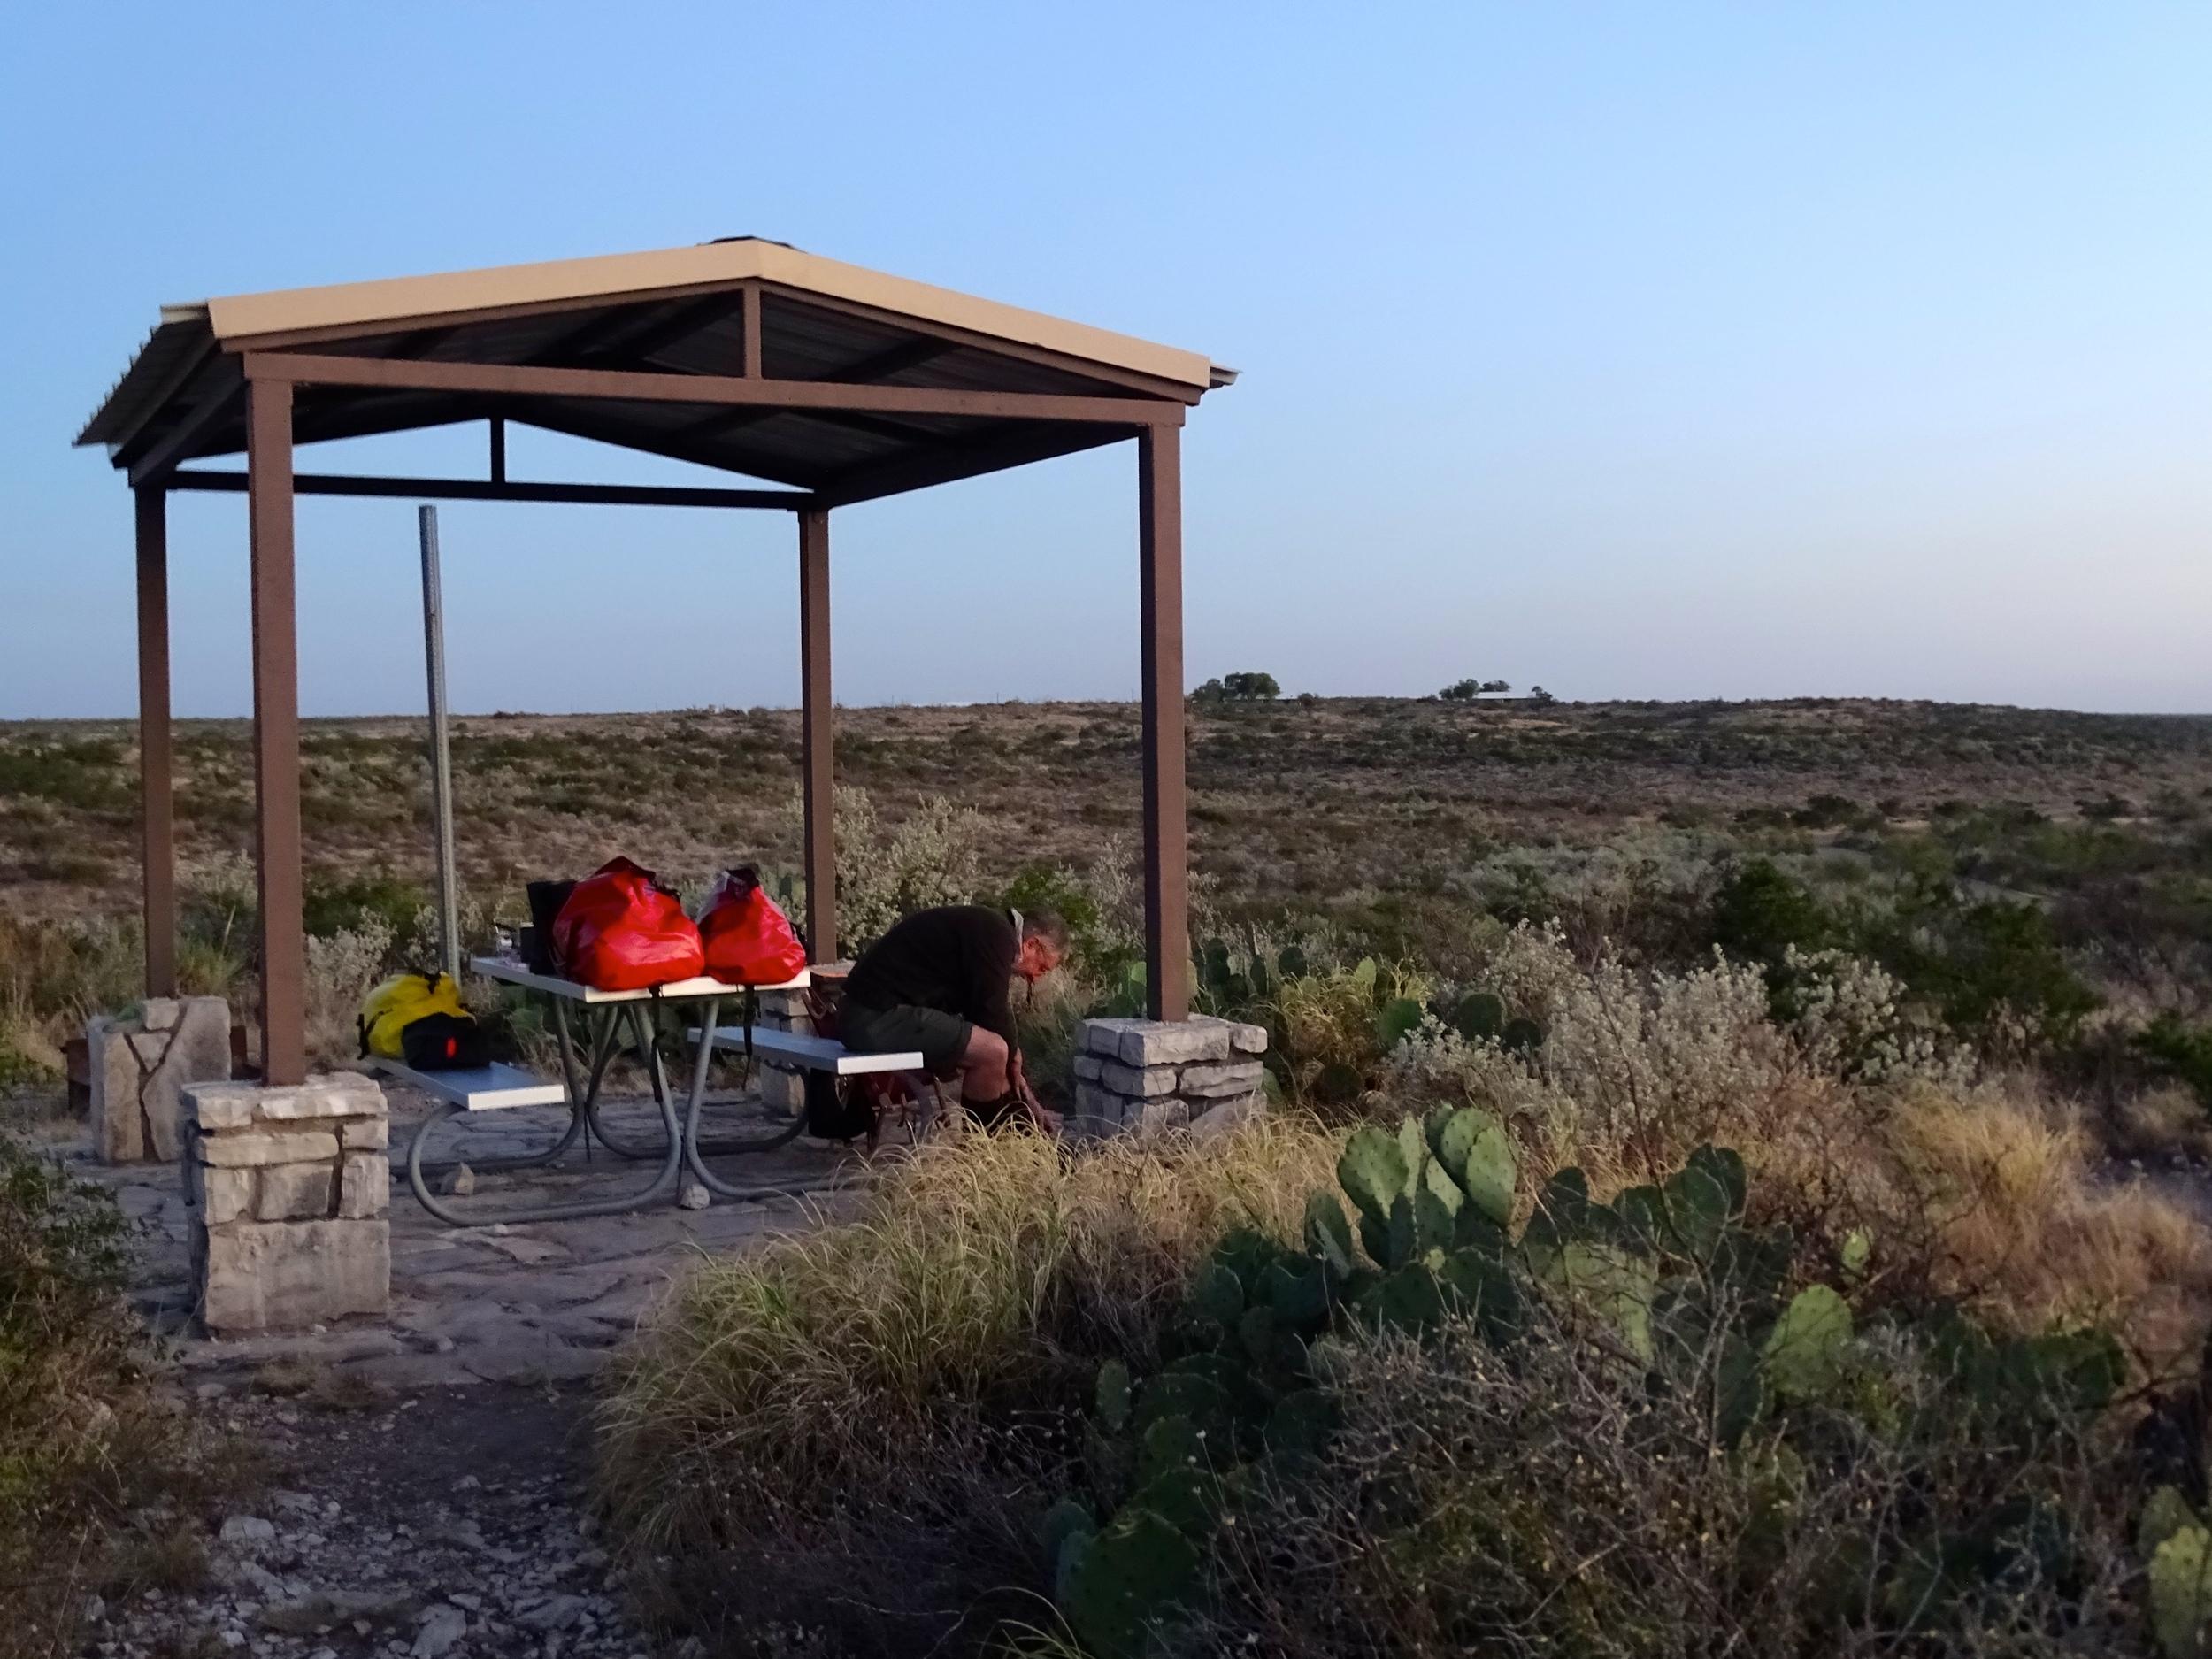 Camp area, nice shade.